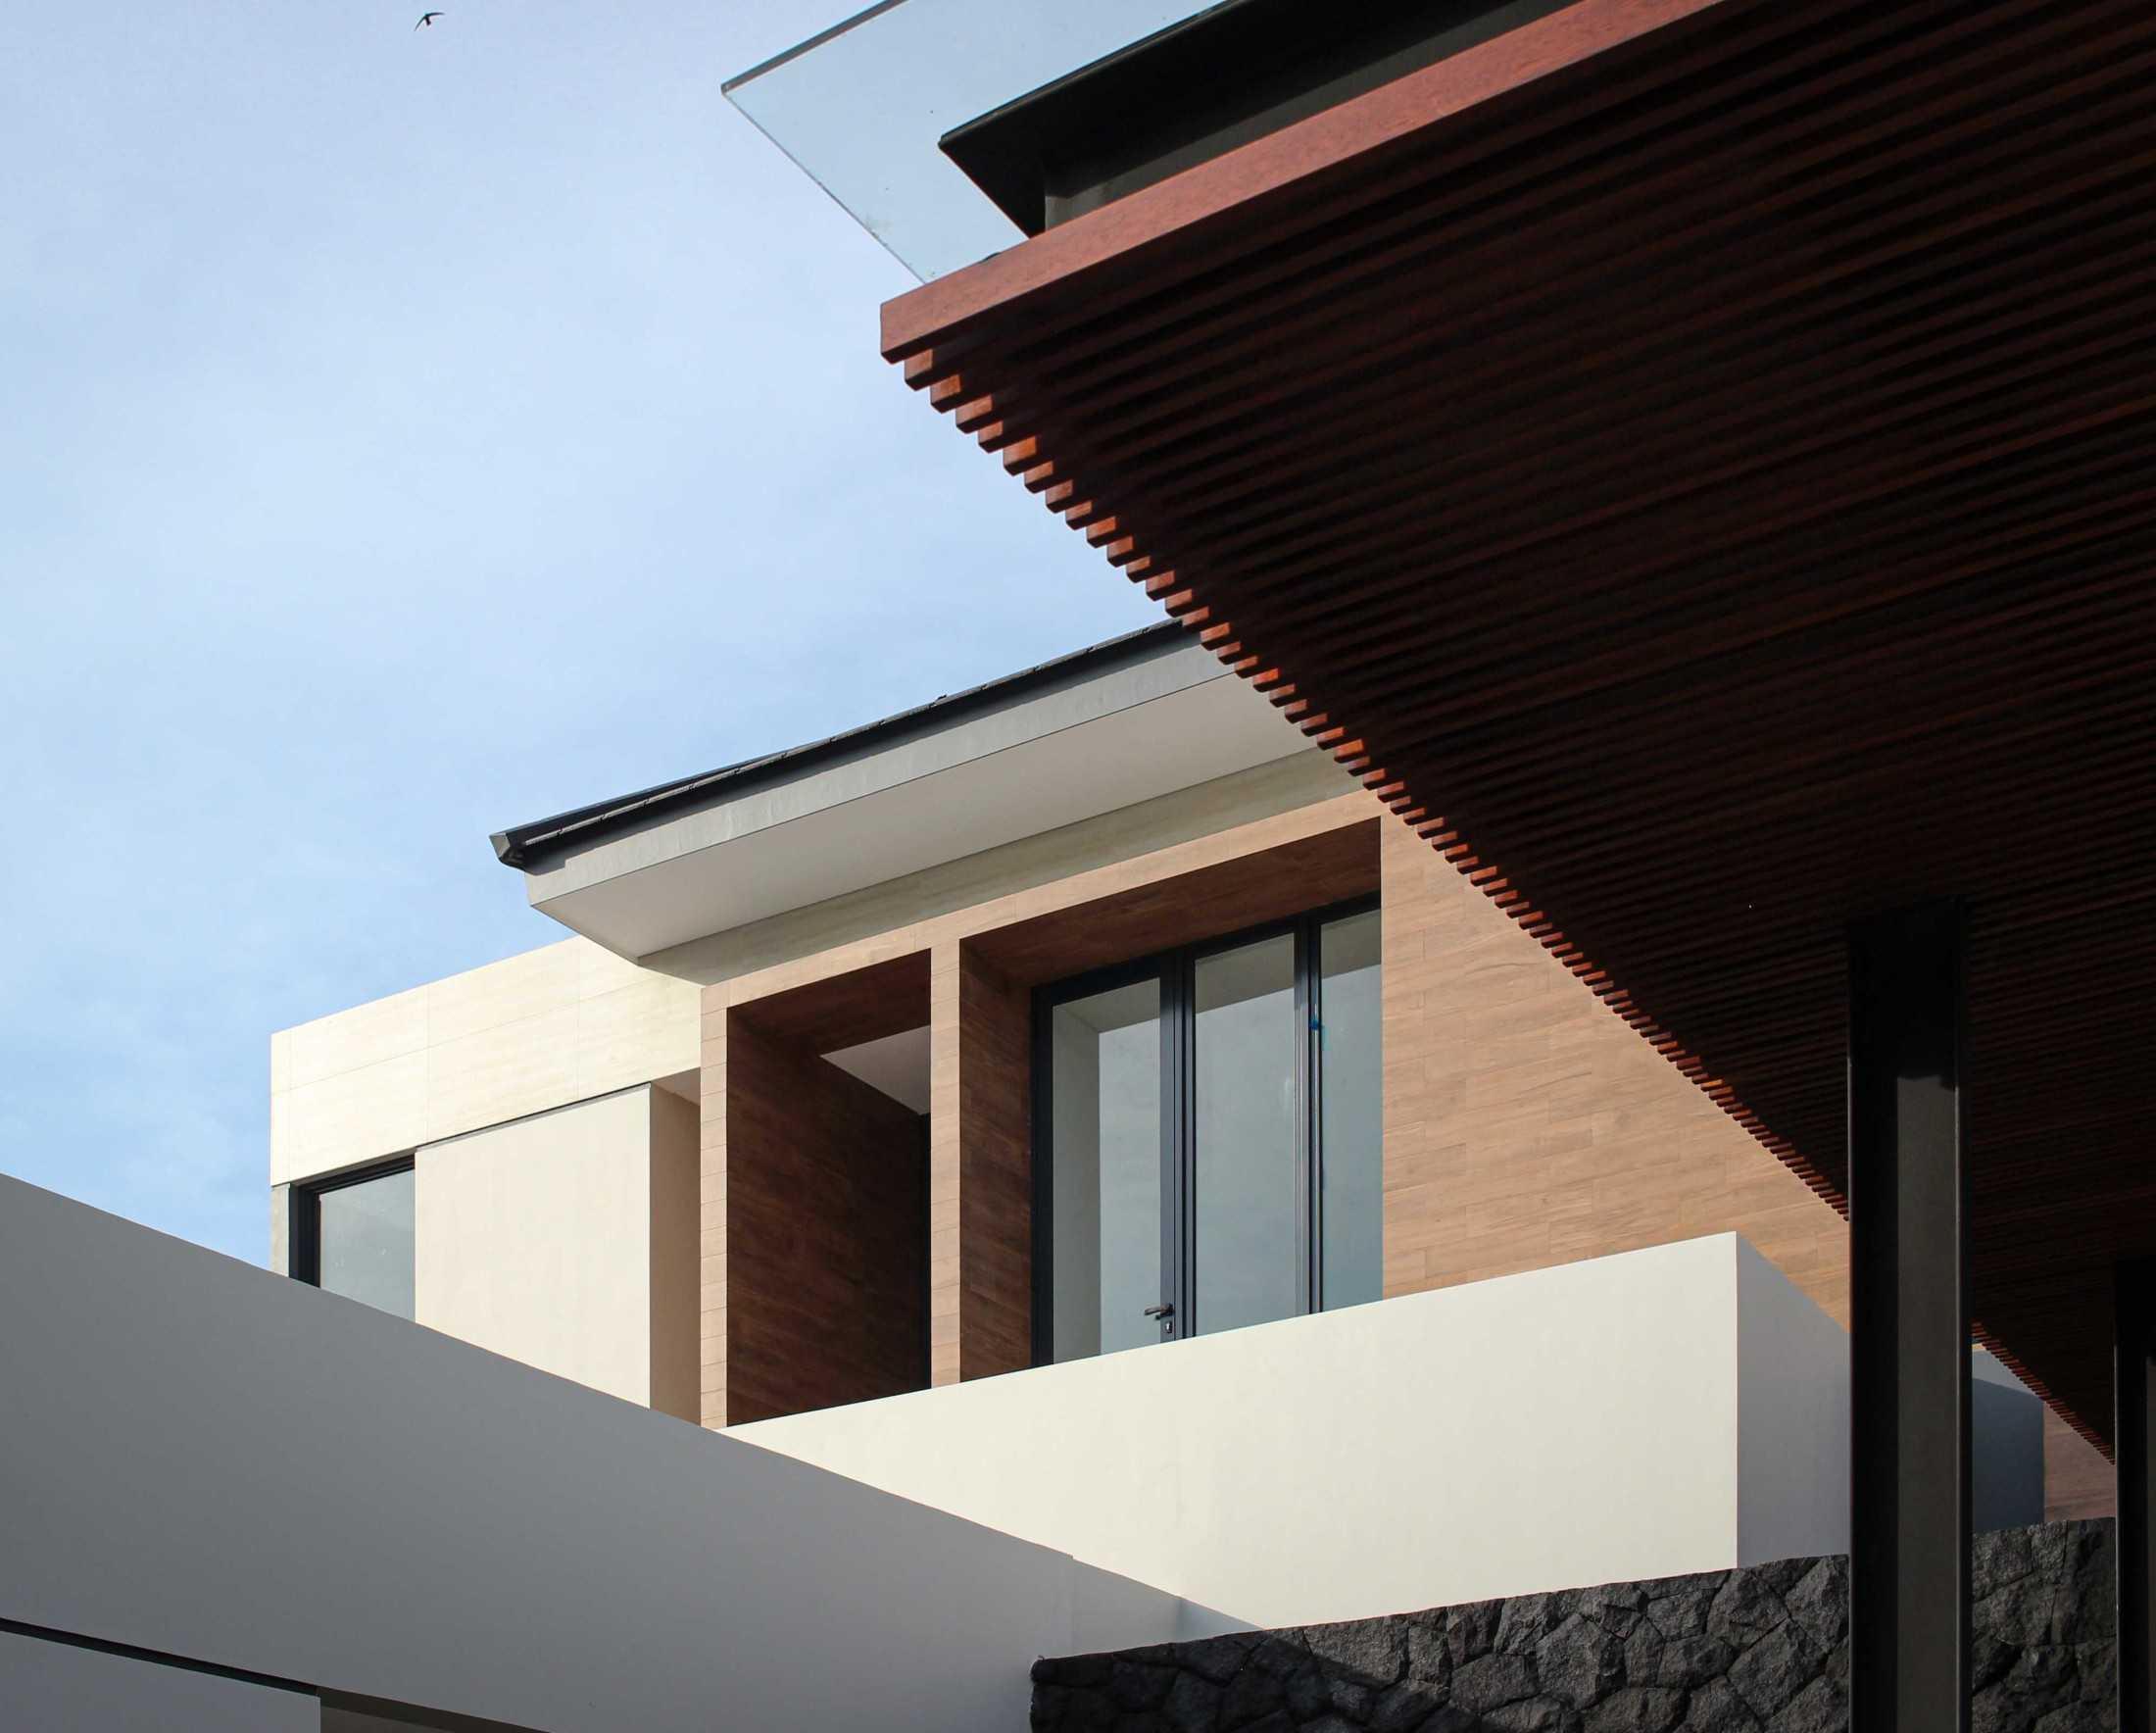 Y0 Design Architect S House Kec. Srono, Kabupaten Banyuwangi, Jawa Timur, Indonesia Kec. Srono, Kabupaten Banyuwangi, Jawa Timur, Indonesia Yohanes-Iswara-Limandjaya-S-House  121081